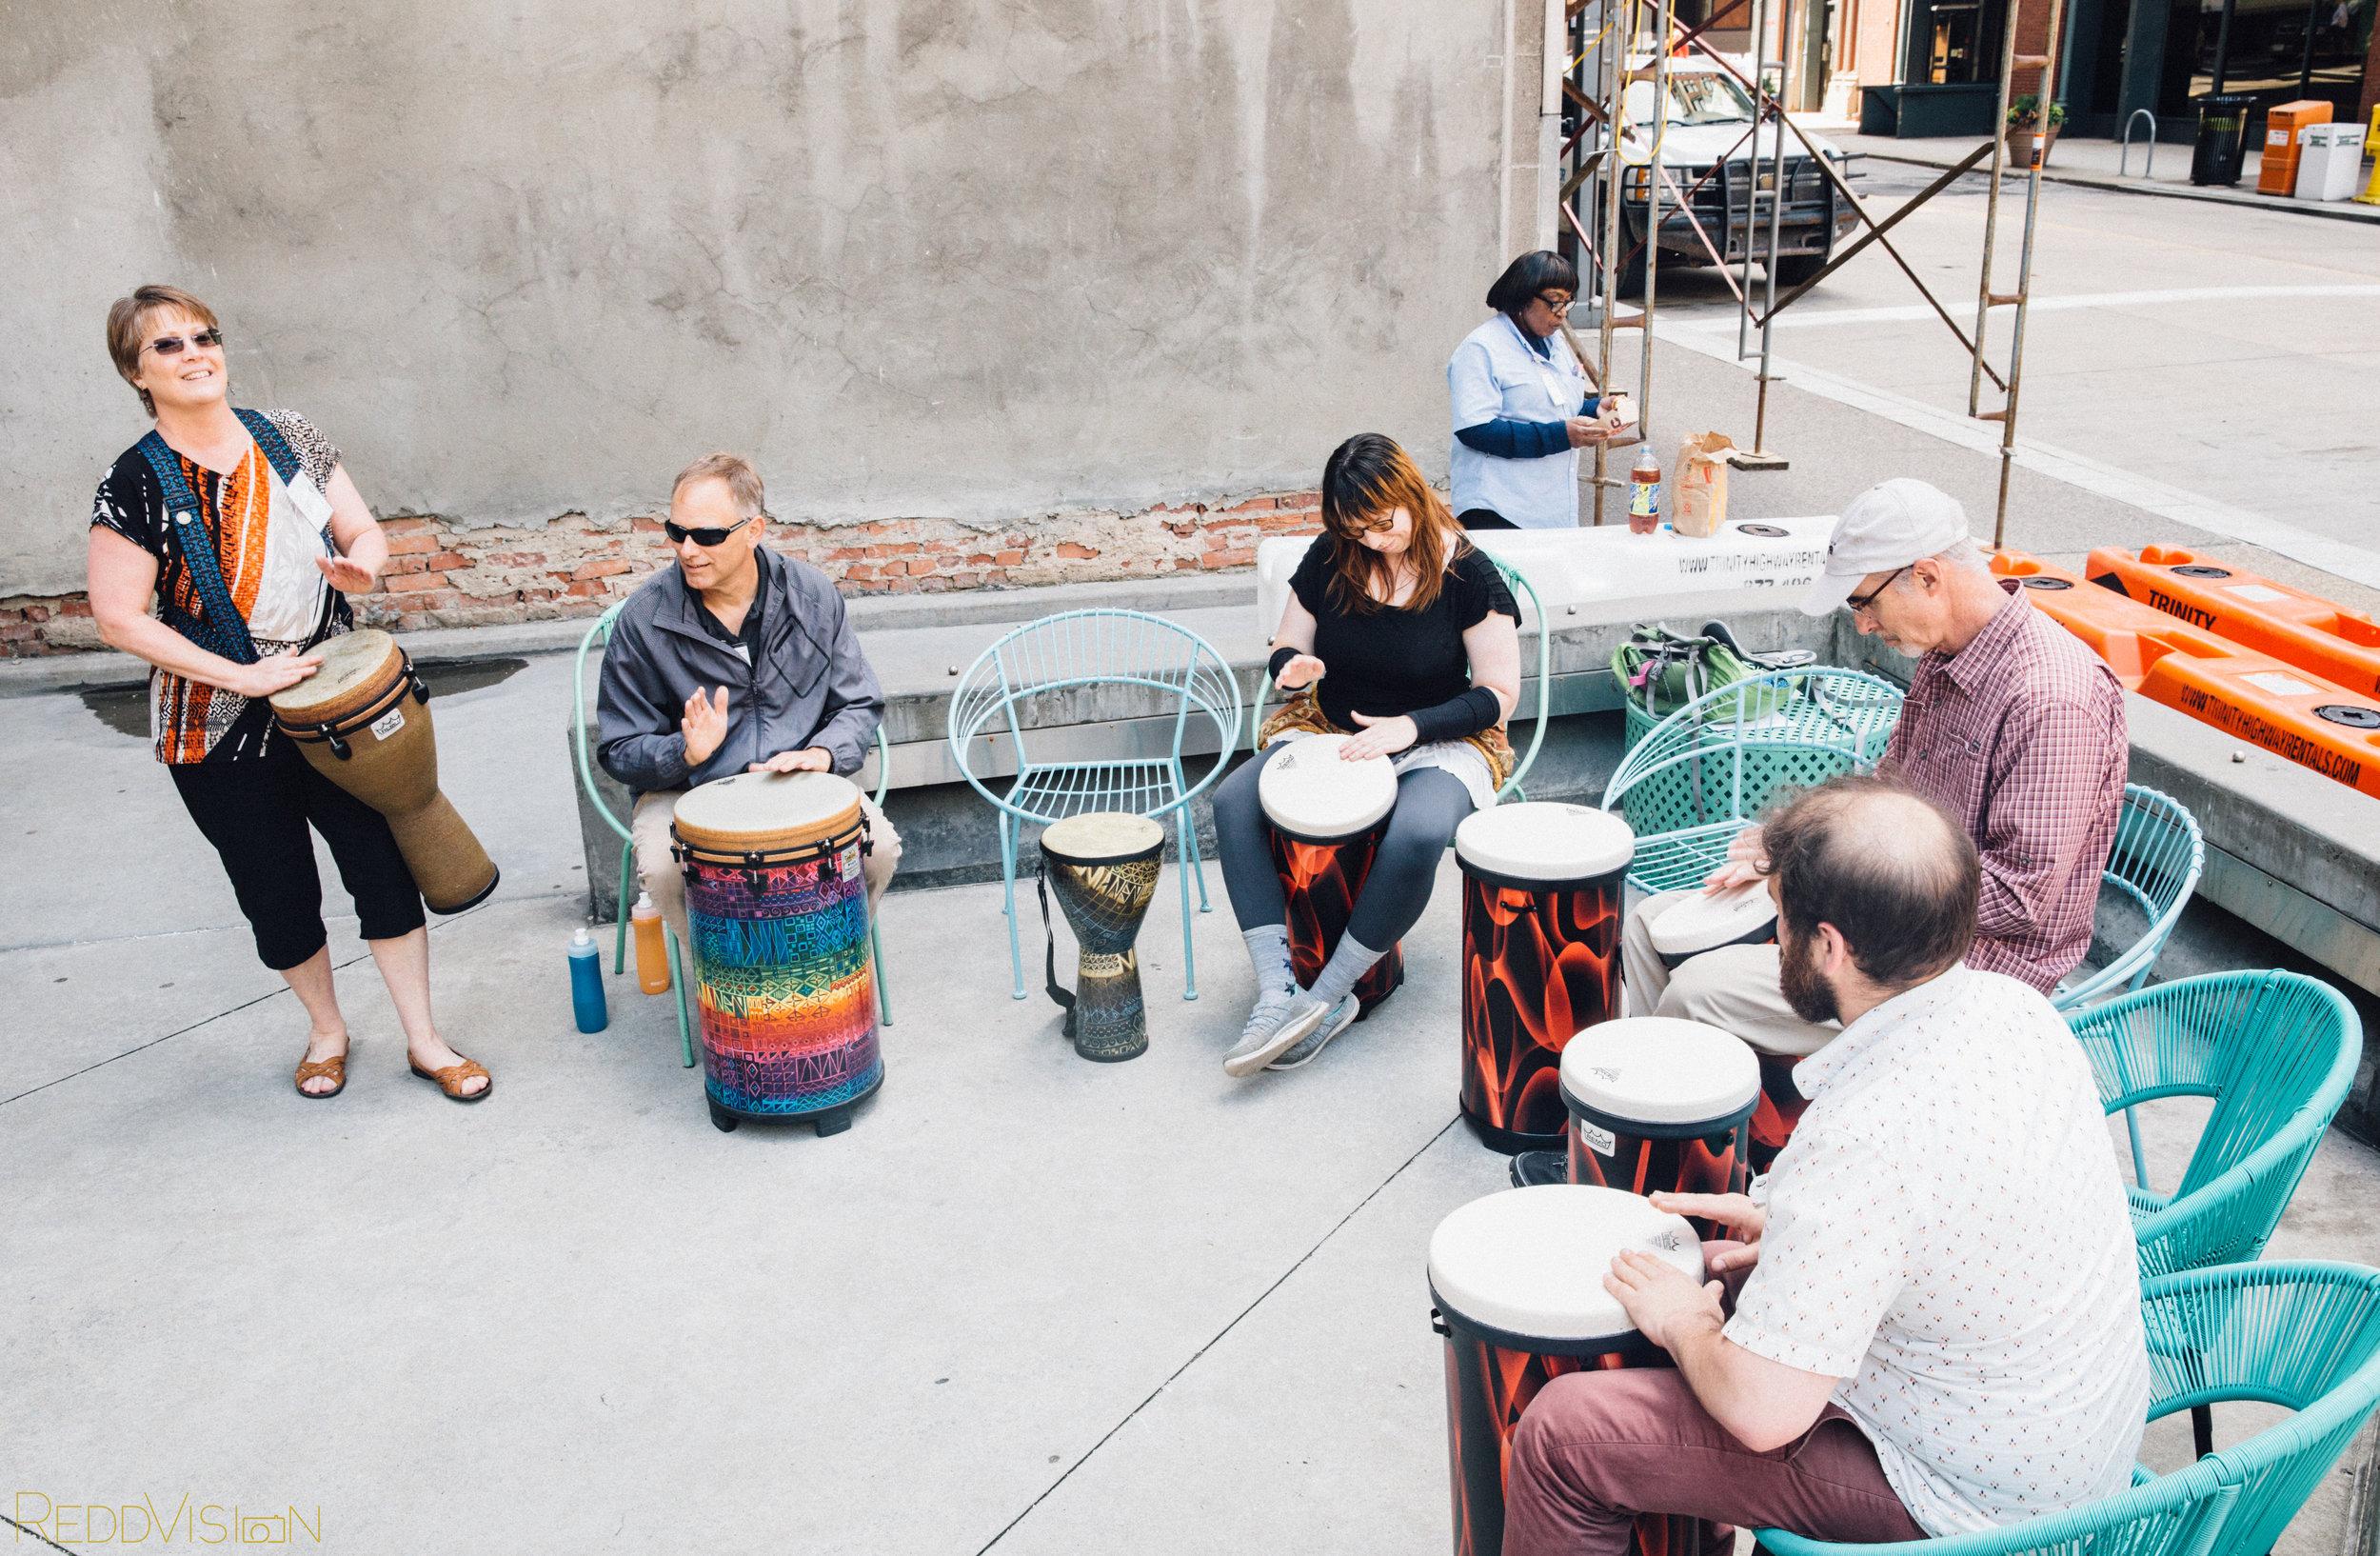 CREATE-Festival-Drum Circle- Copy - Copy (2).jpg